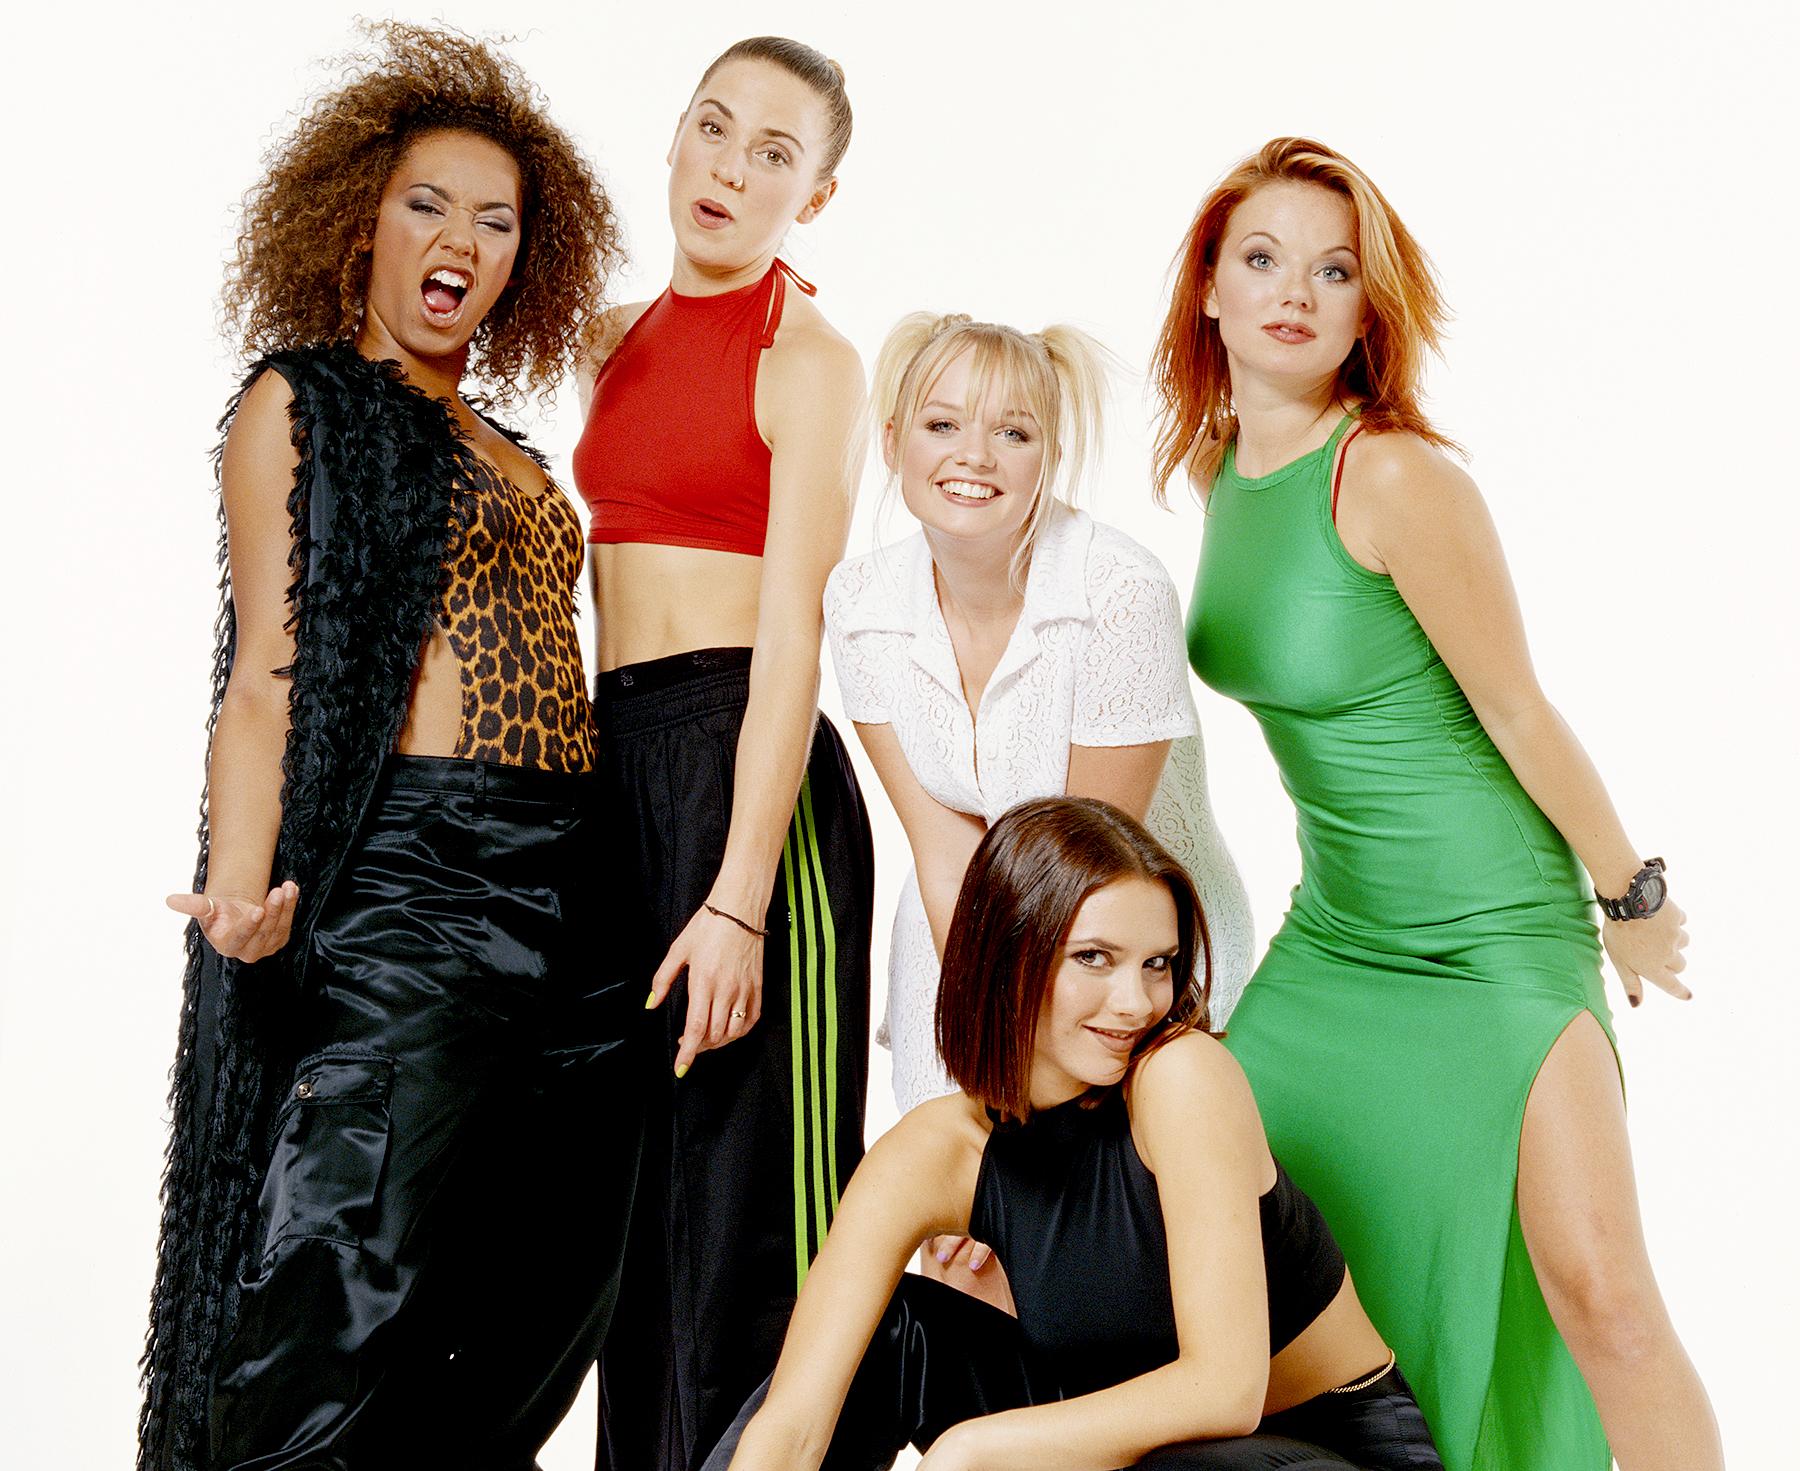 The Spice Girls, circa 1996